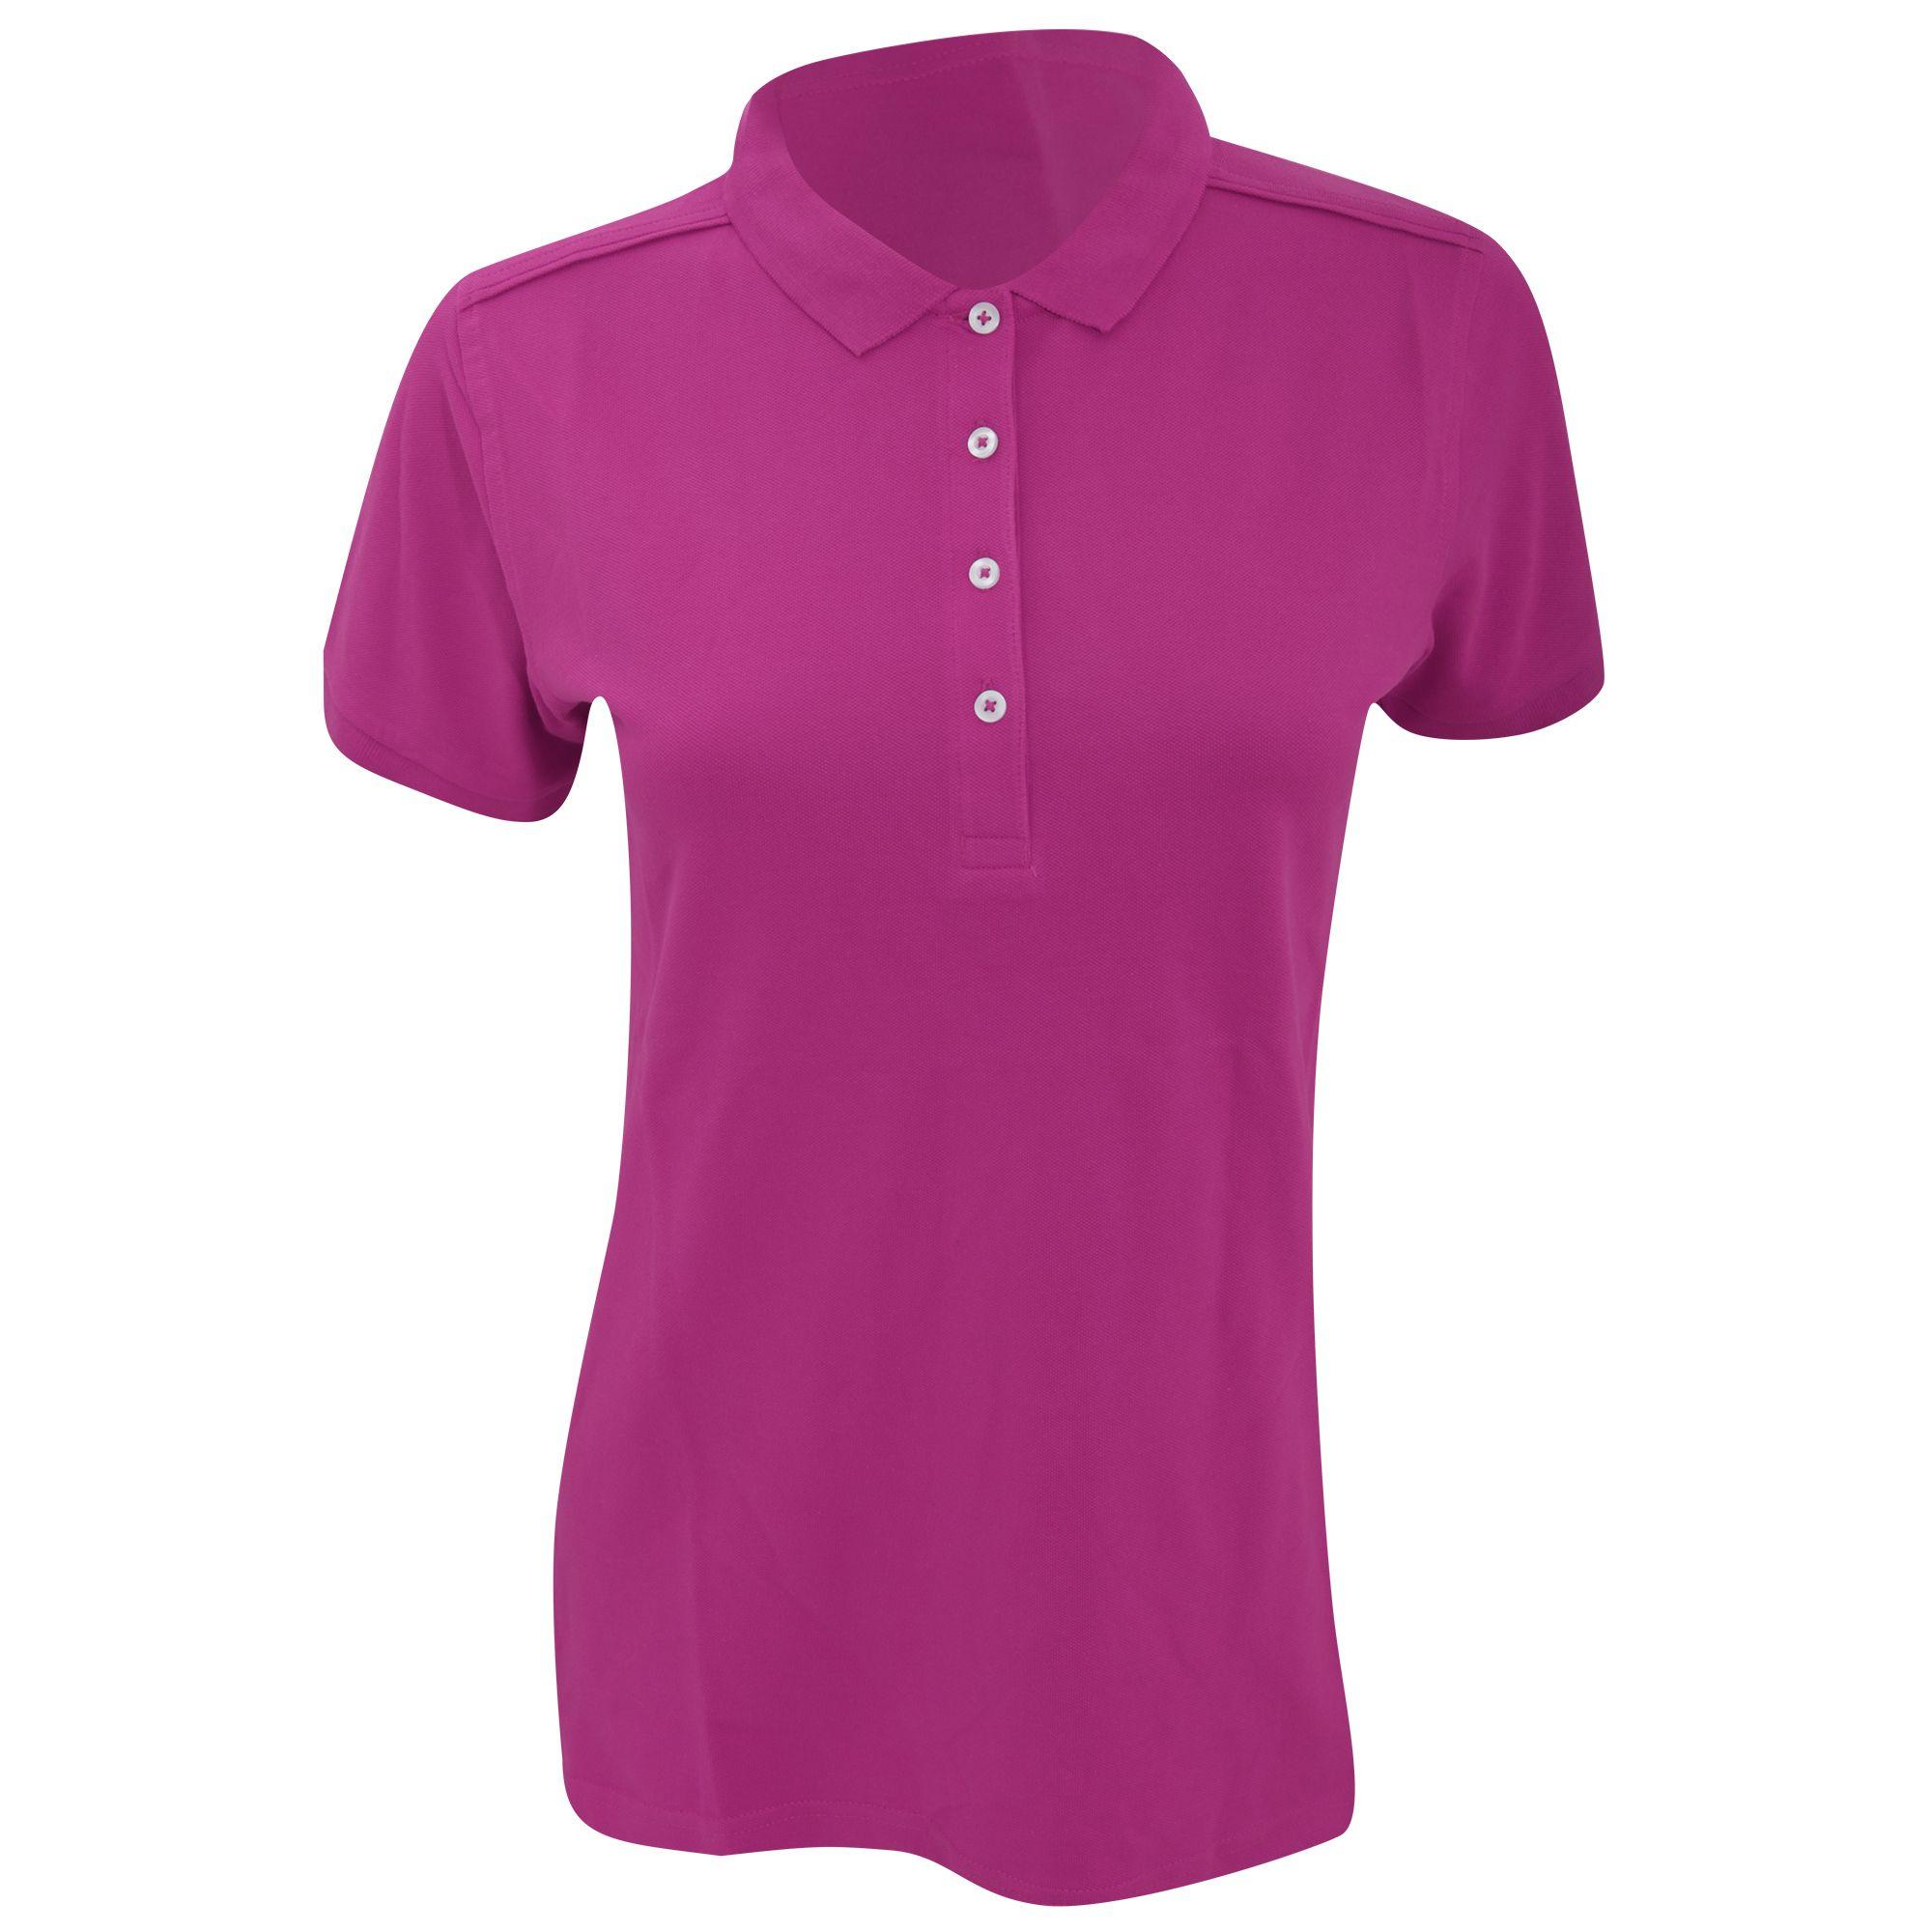 Russell Womens/Ladies Stretch Short Sleeve Polo Shirt (Fuchsia)